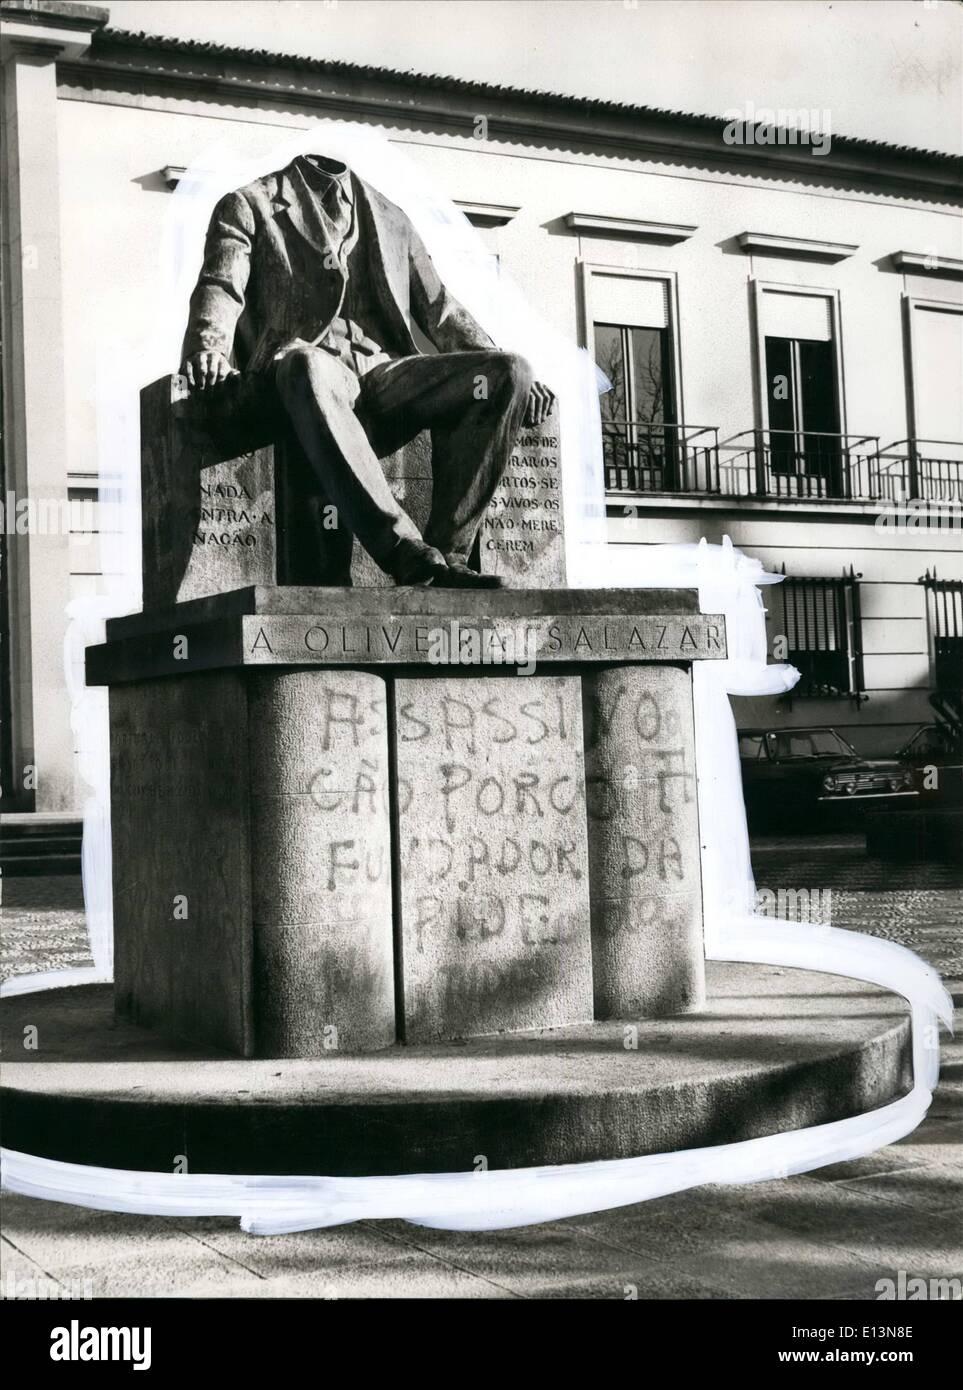 Mar 22 2012 the last symbol of the fascist dictatorship in 22 2012 the last symbol of the fascist dictatorship in portugal as biocorpaavc Choice Image